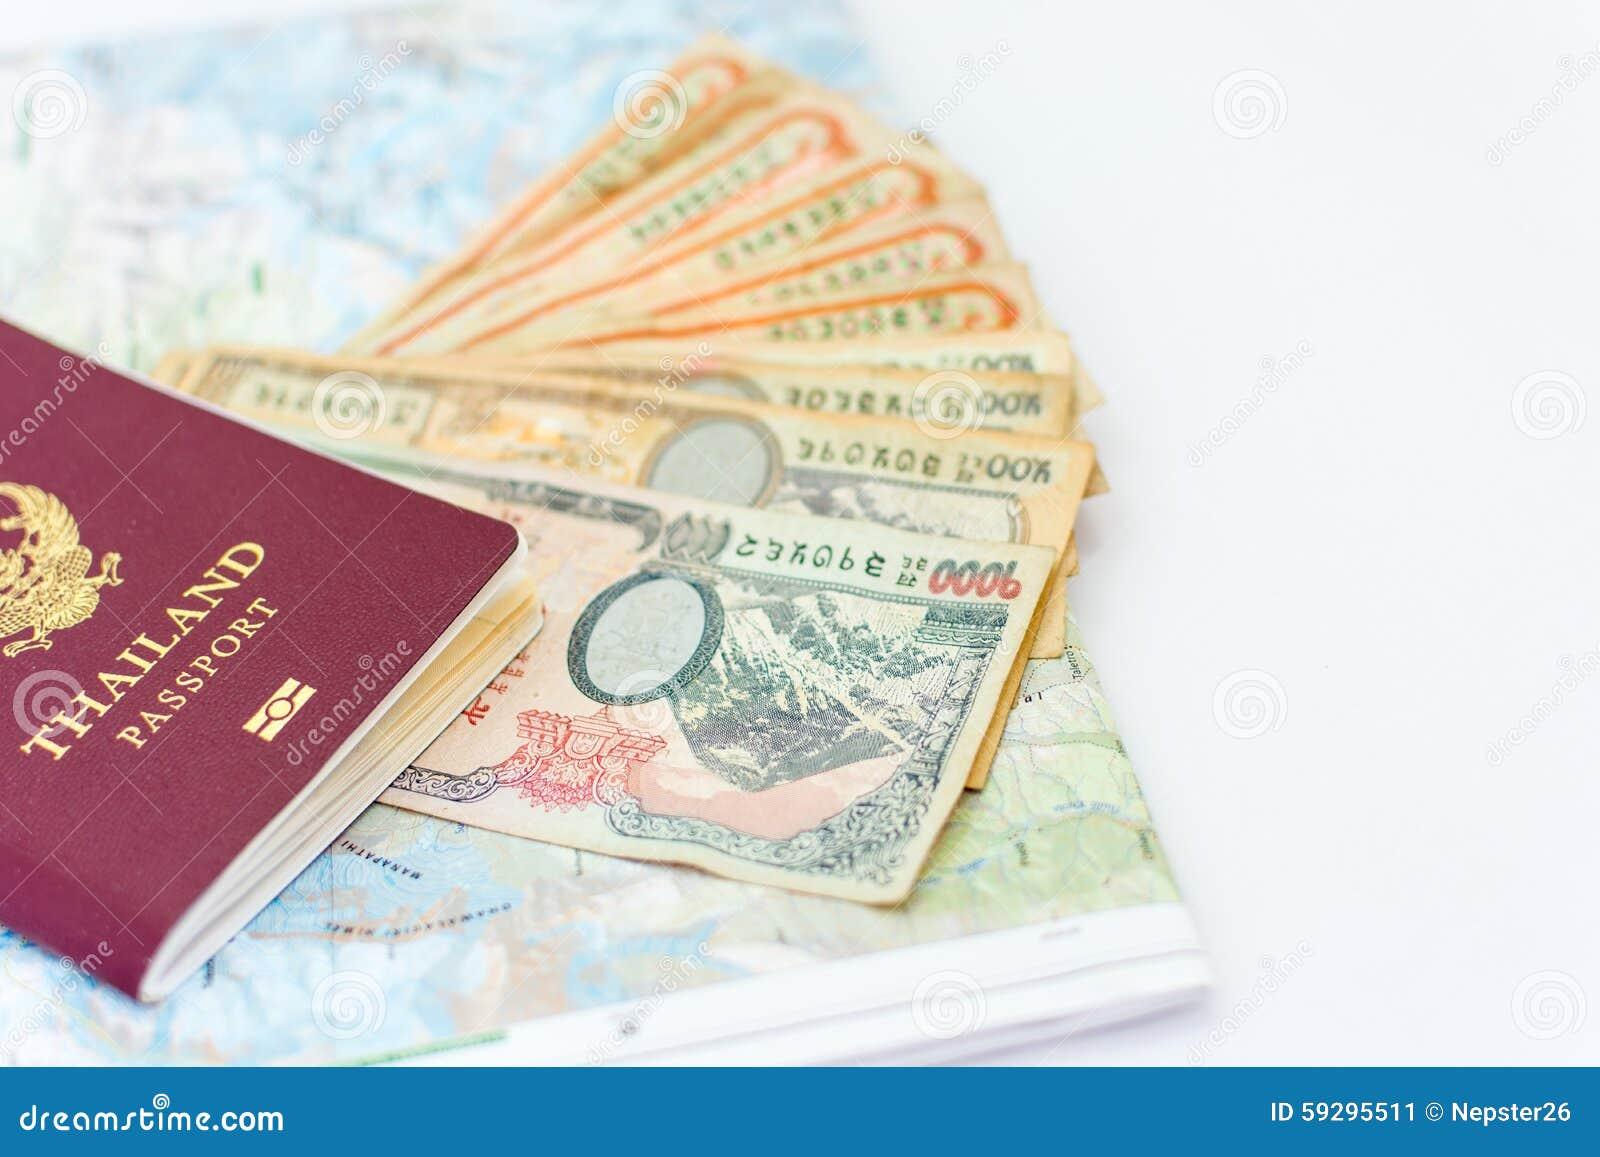 Het paspoort van Thailand voor toerisme met Annapurna-Gebied Nepal brengt a in kaart